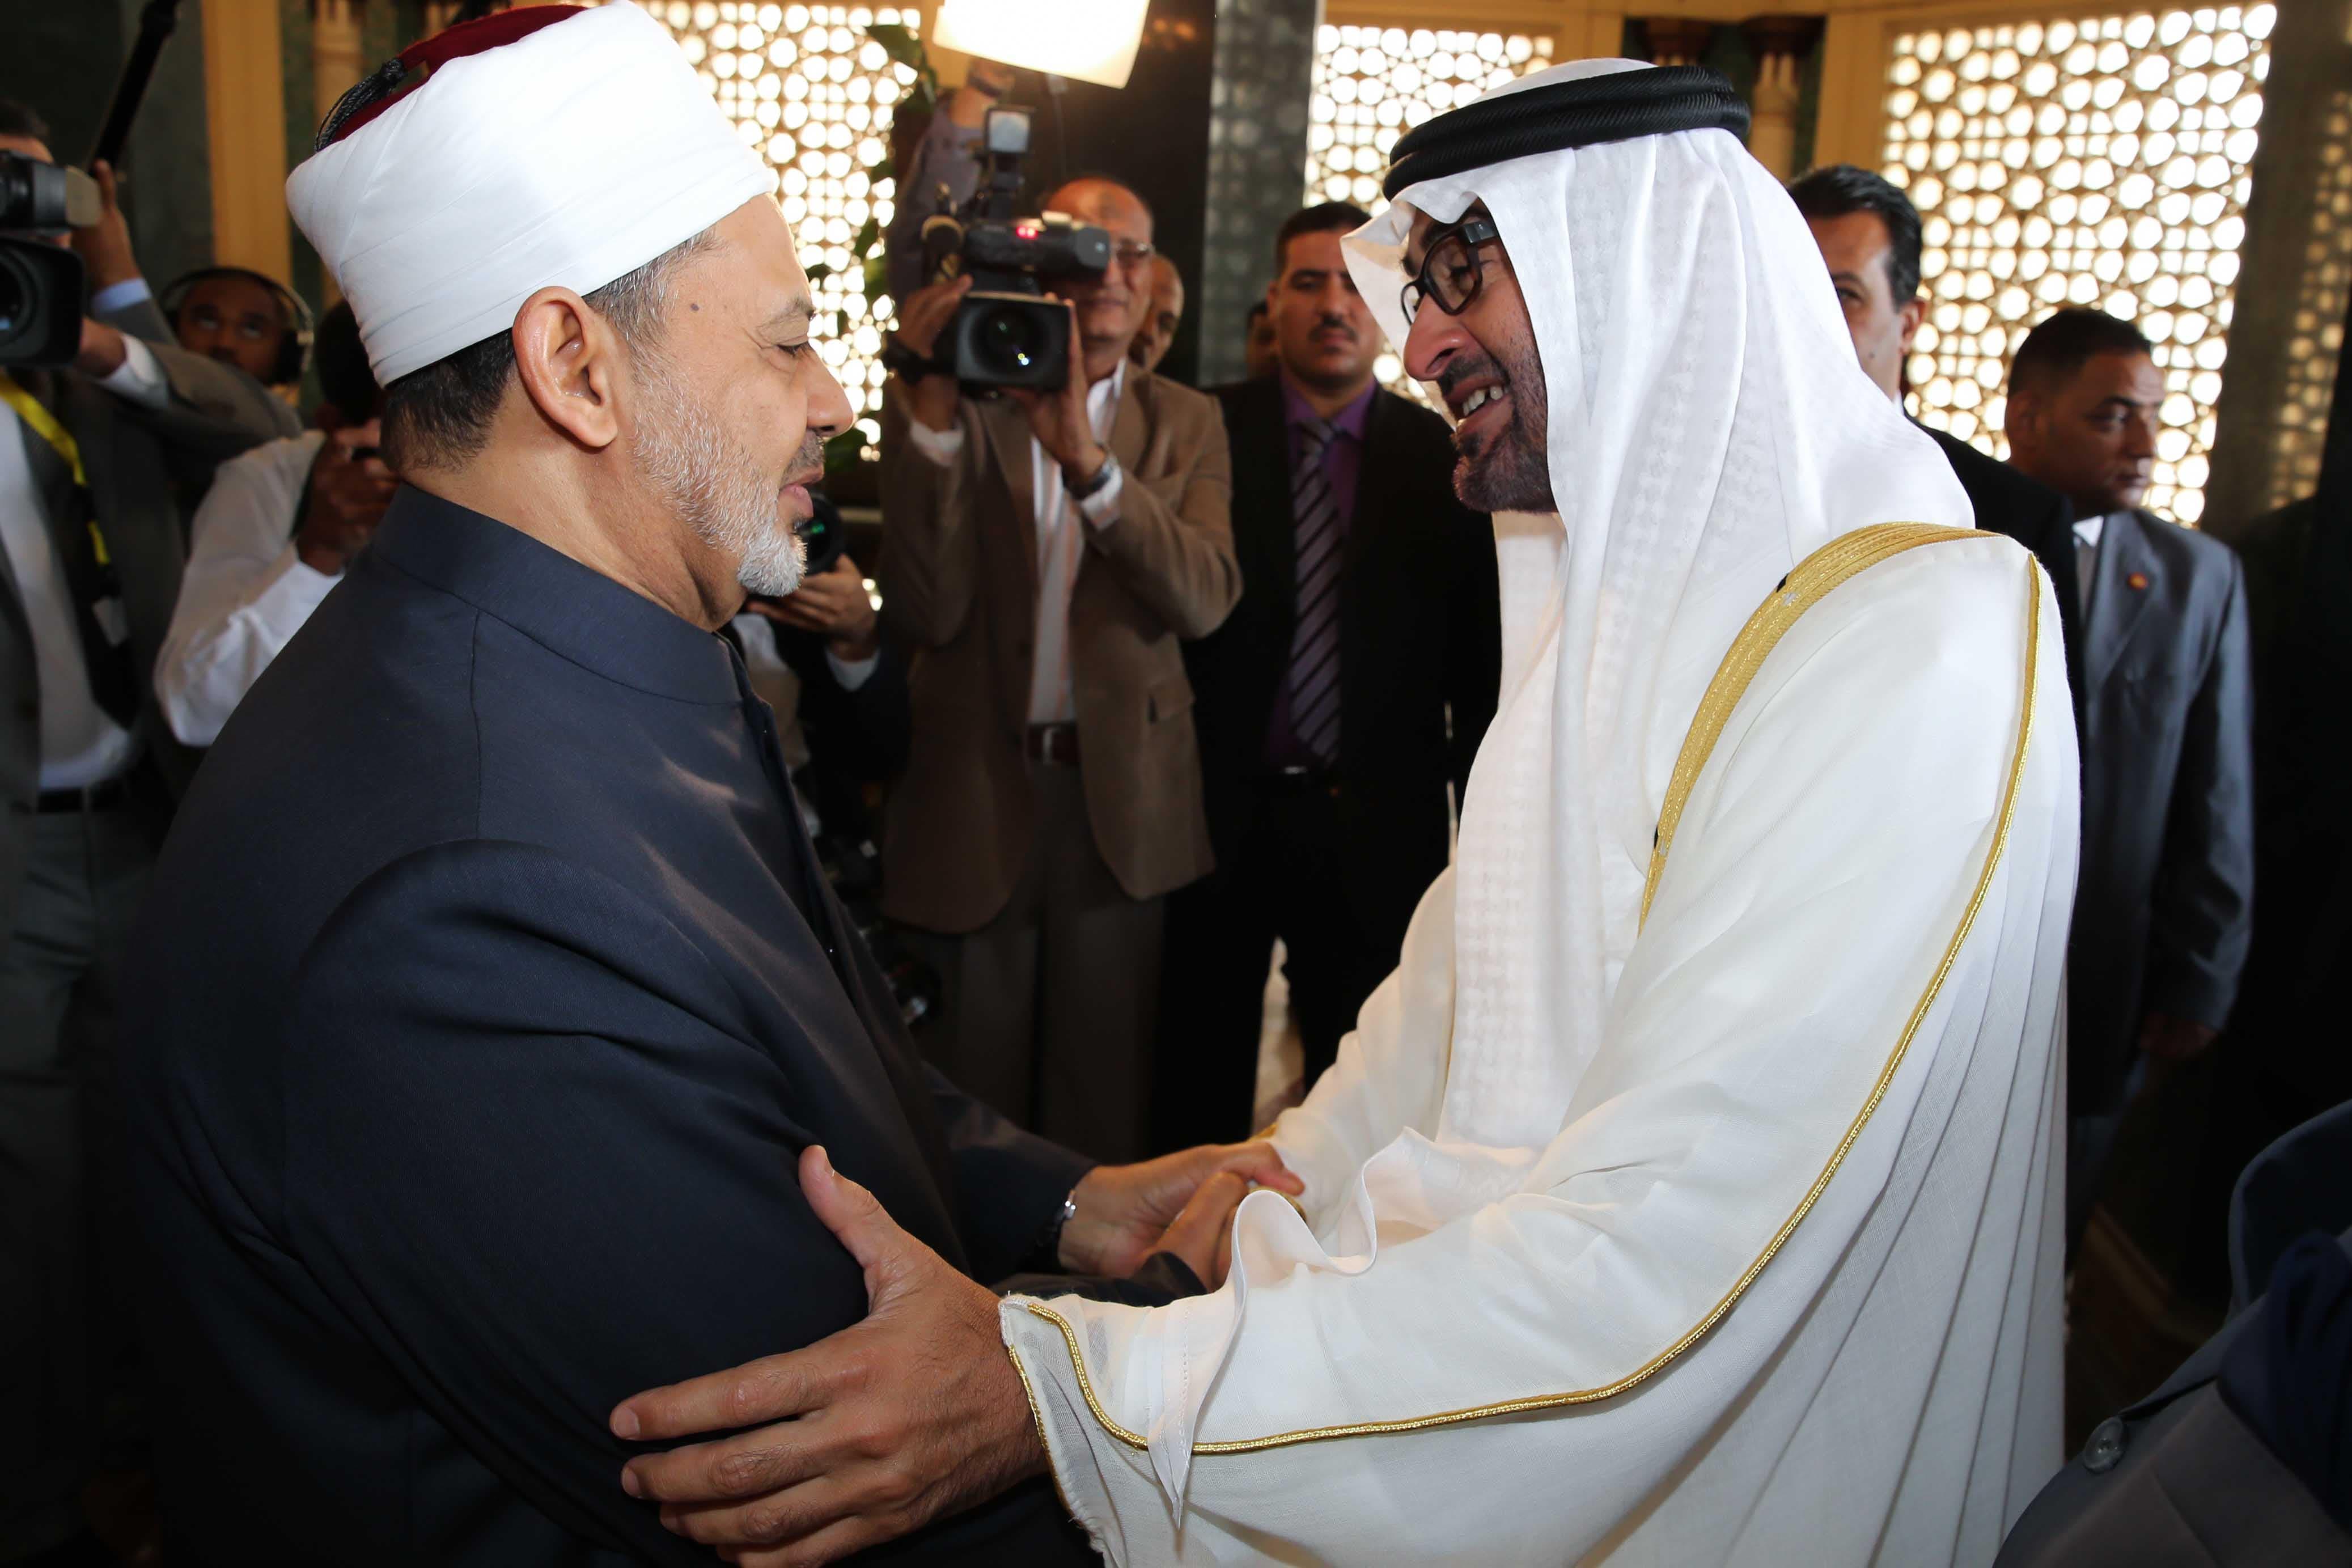 The Grand Imam of al-Azhar welcomes an Emirati delegation.